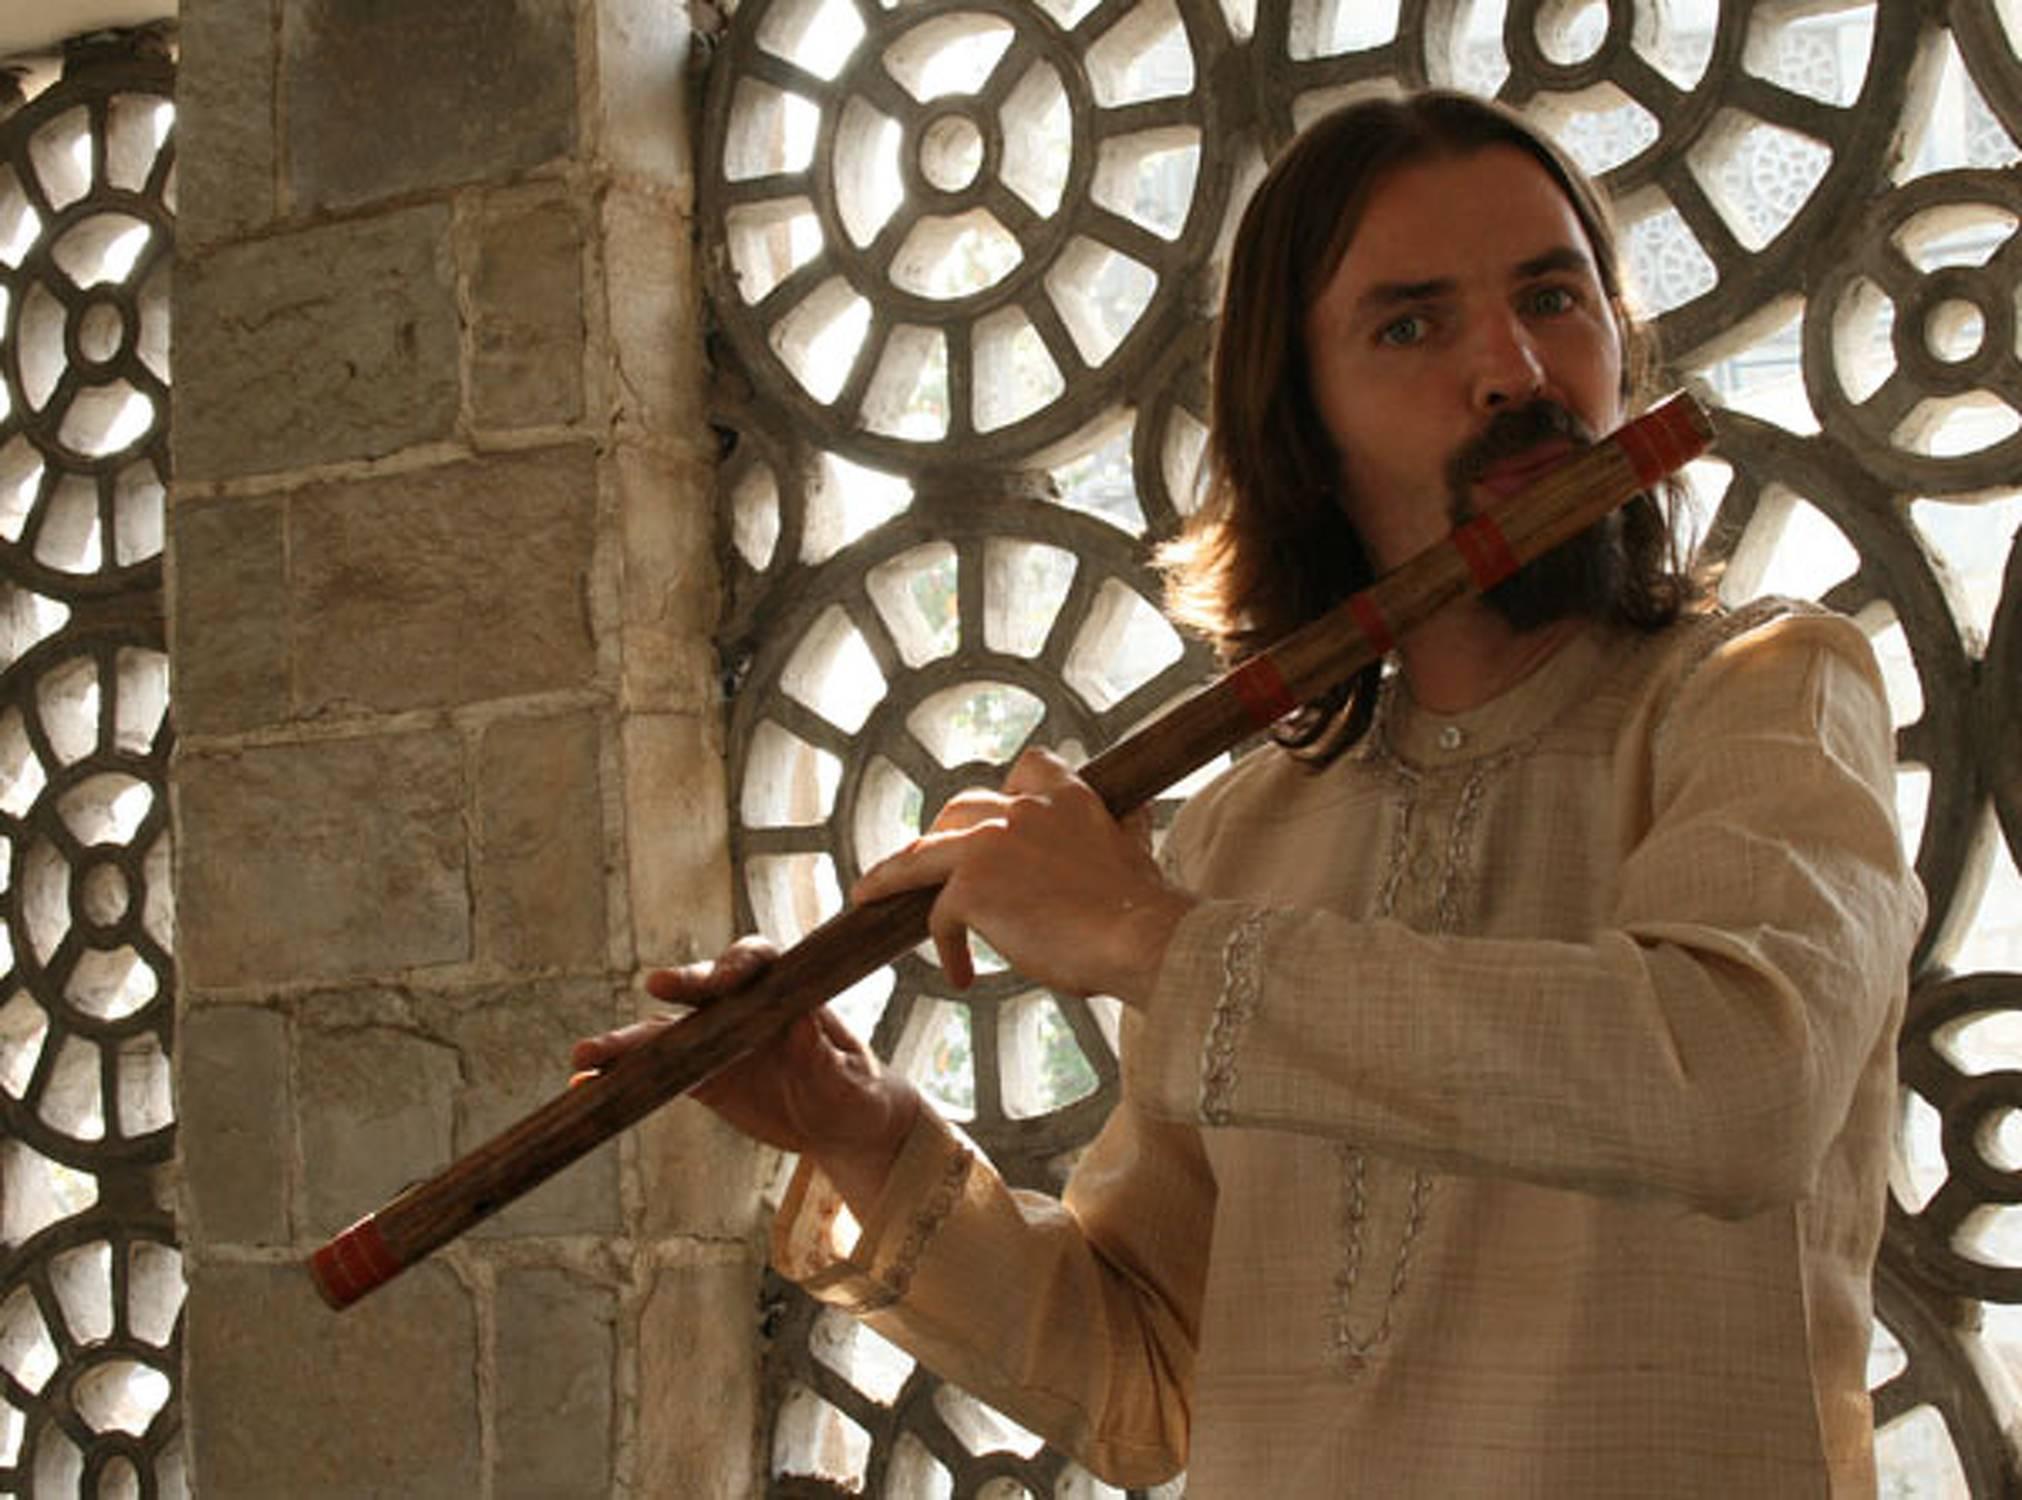 Ernest Jepifanov Violine Viola Und Bambusquerflote Kunstler